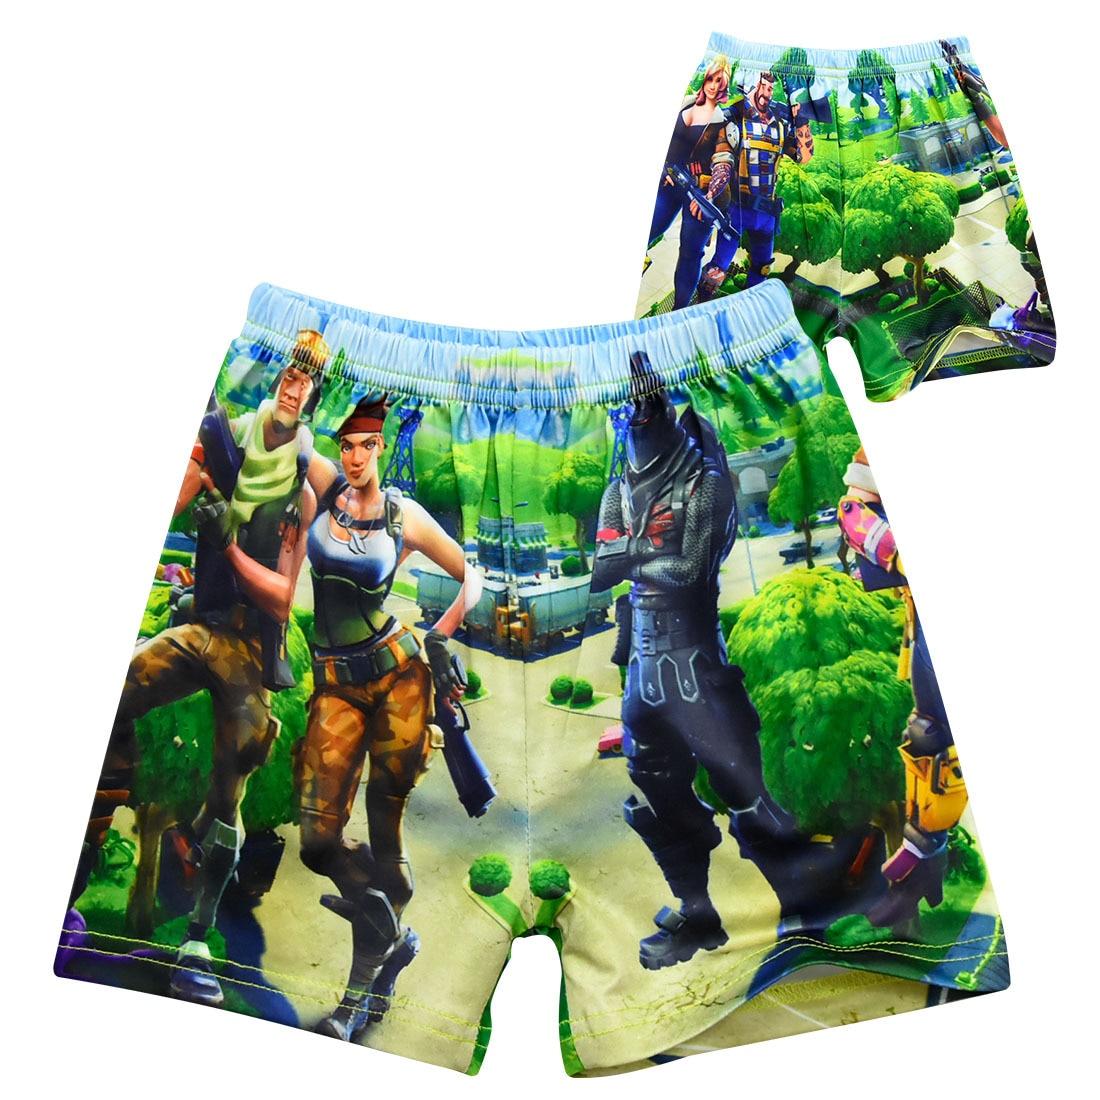 2019 New Boys Swimming Trunks Cartoon Swimsuit For Boys Summer Swim Trunk Kids Beach Wear Boy Swimwear G48-H